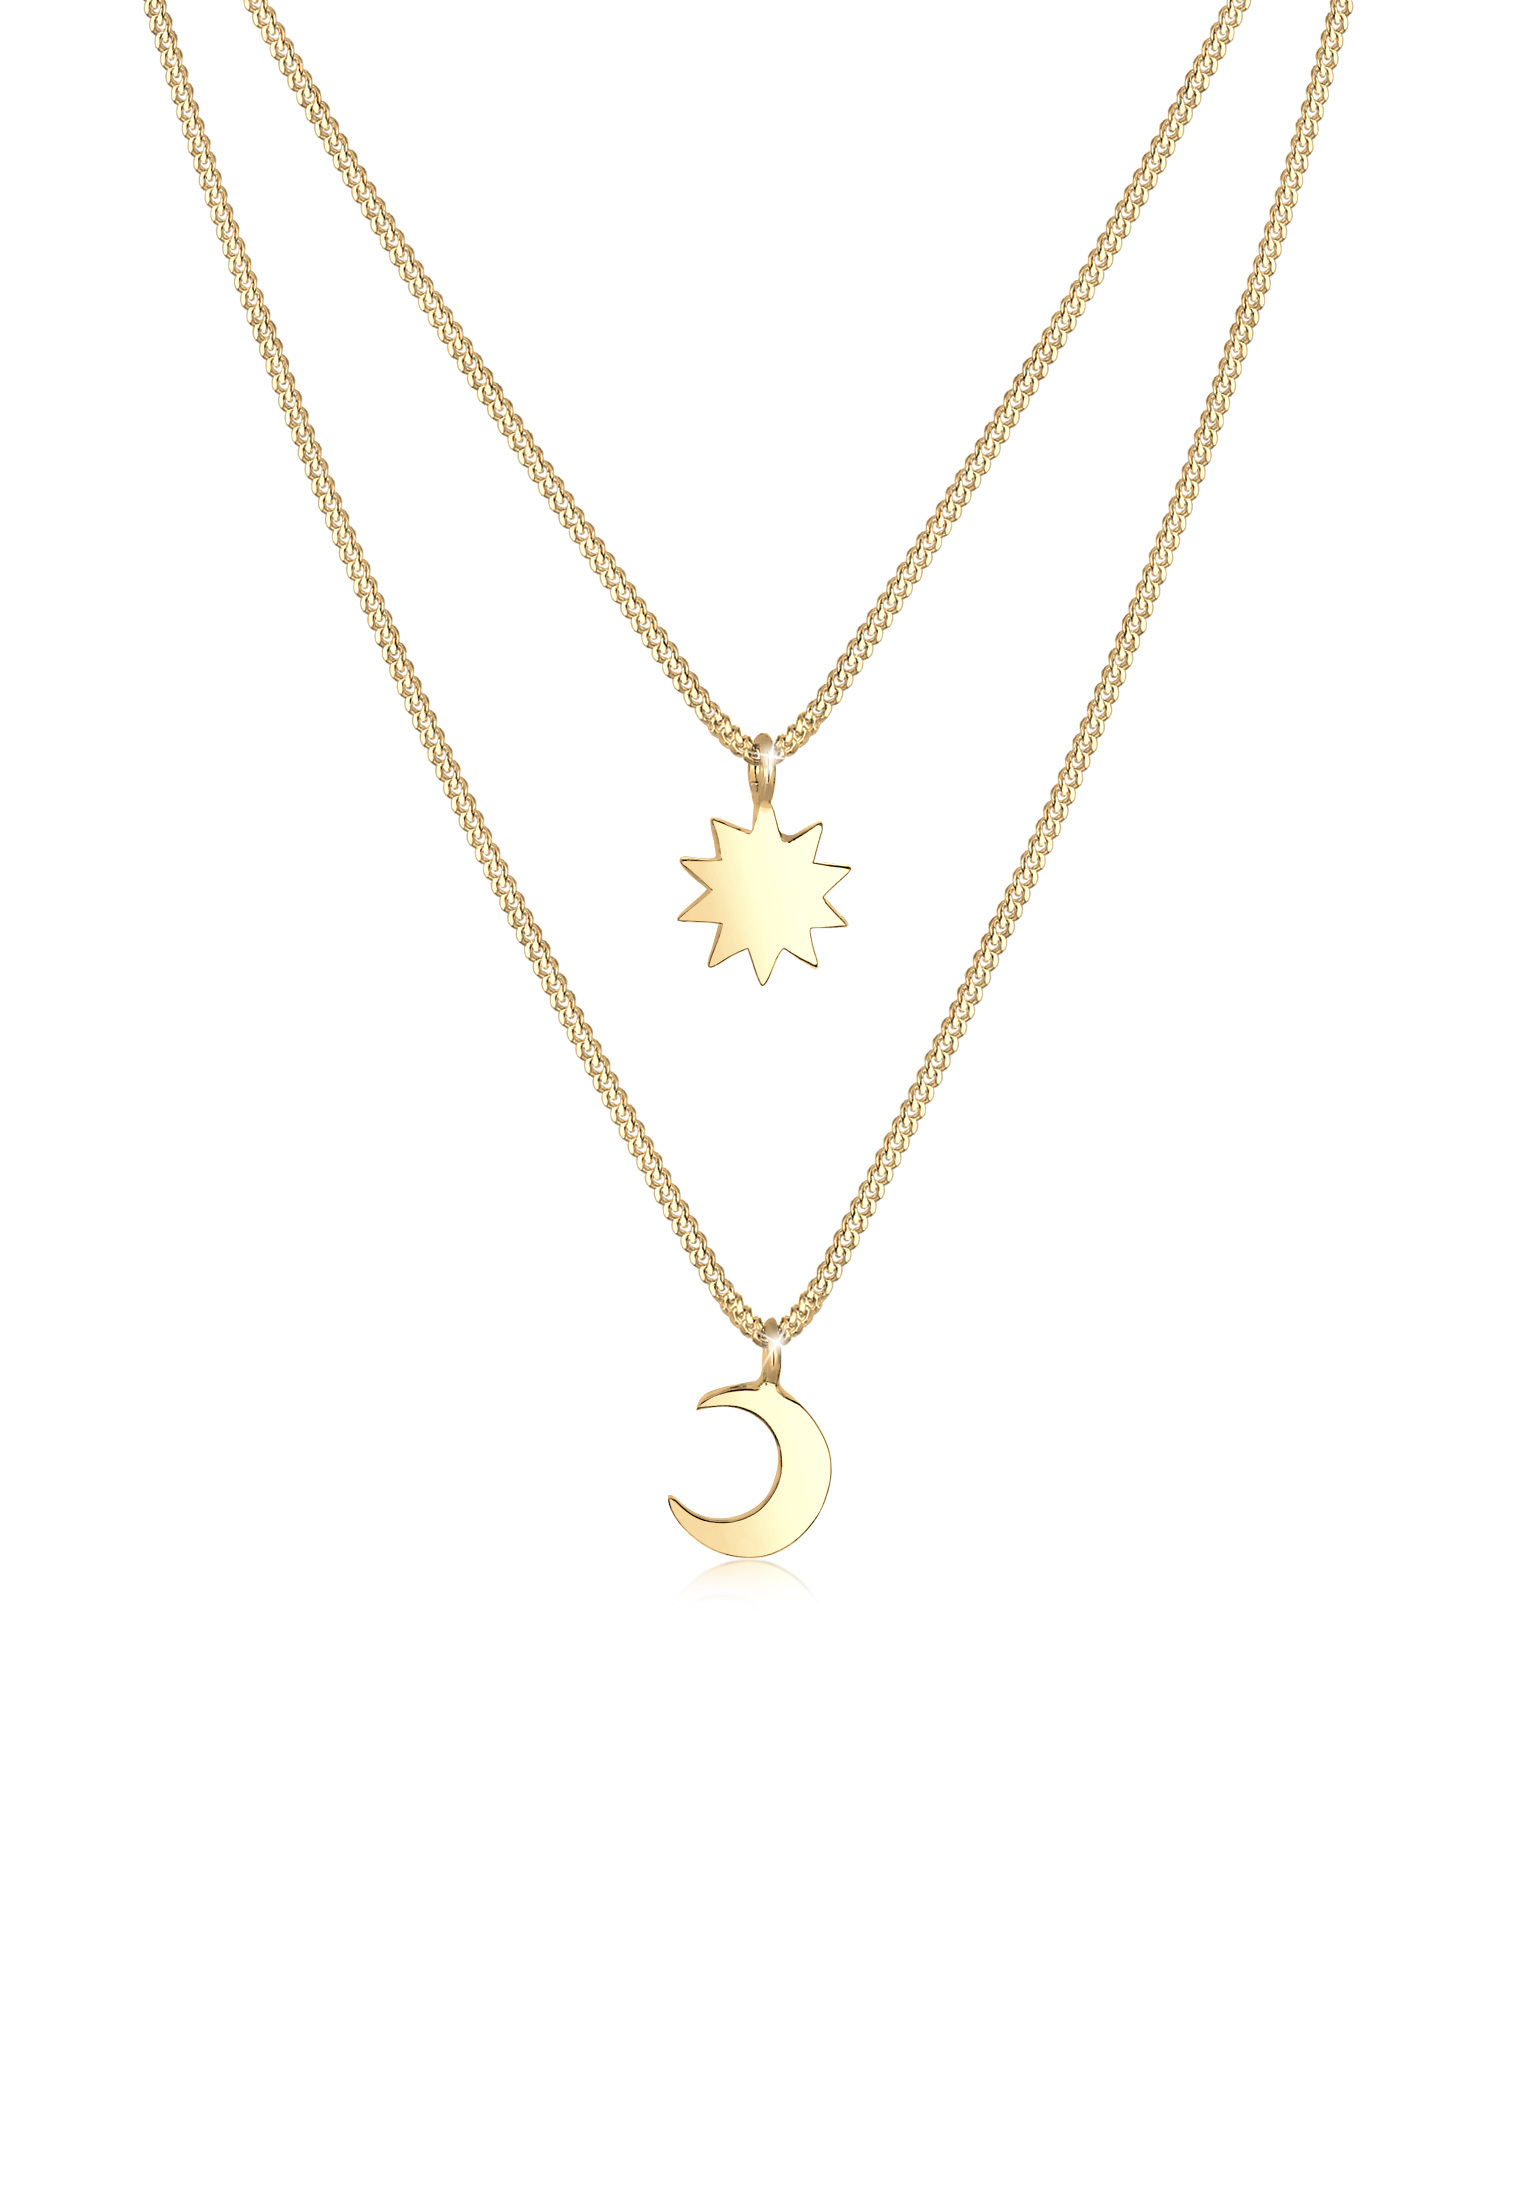 Layer-Halskette Halbmond   925 Sterling Silber vergoldet